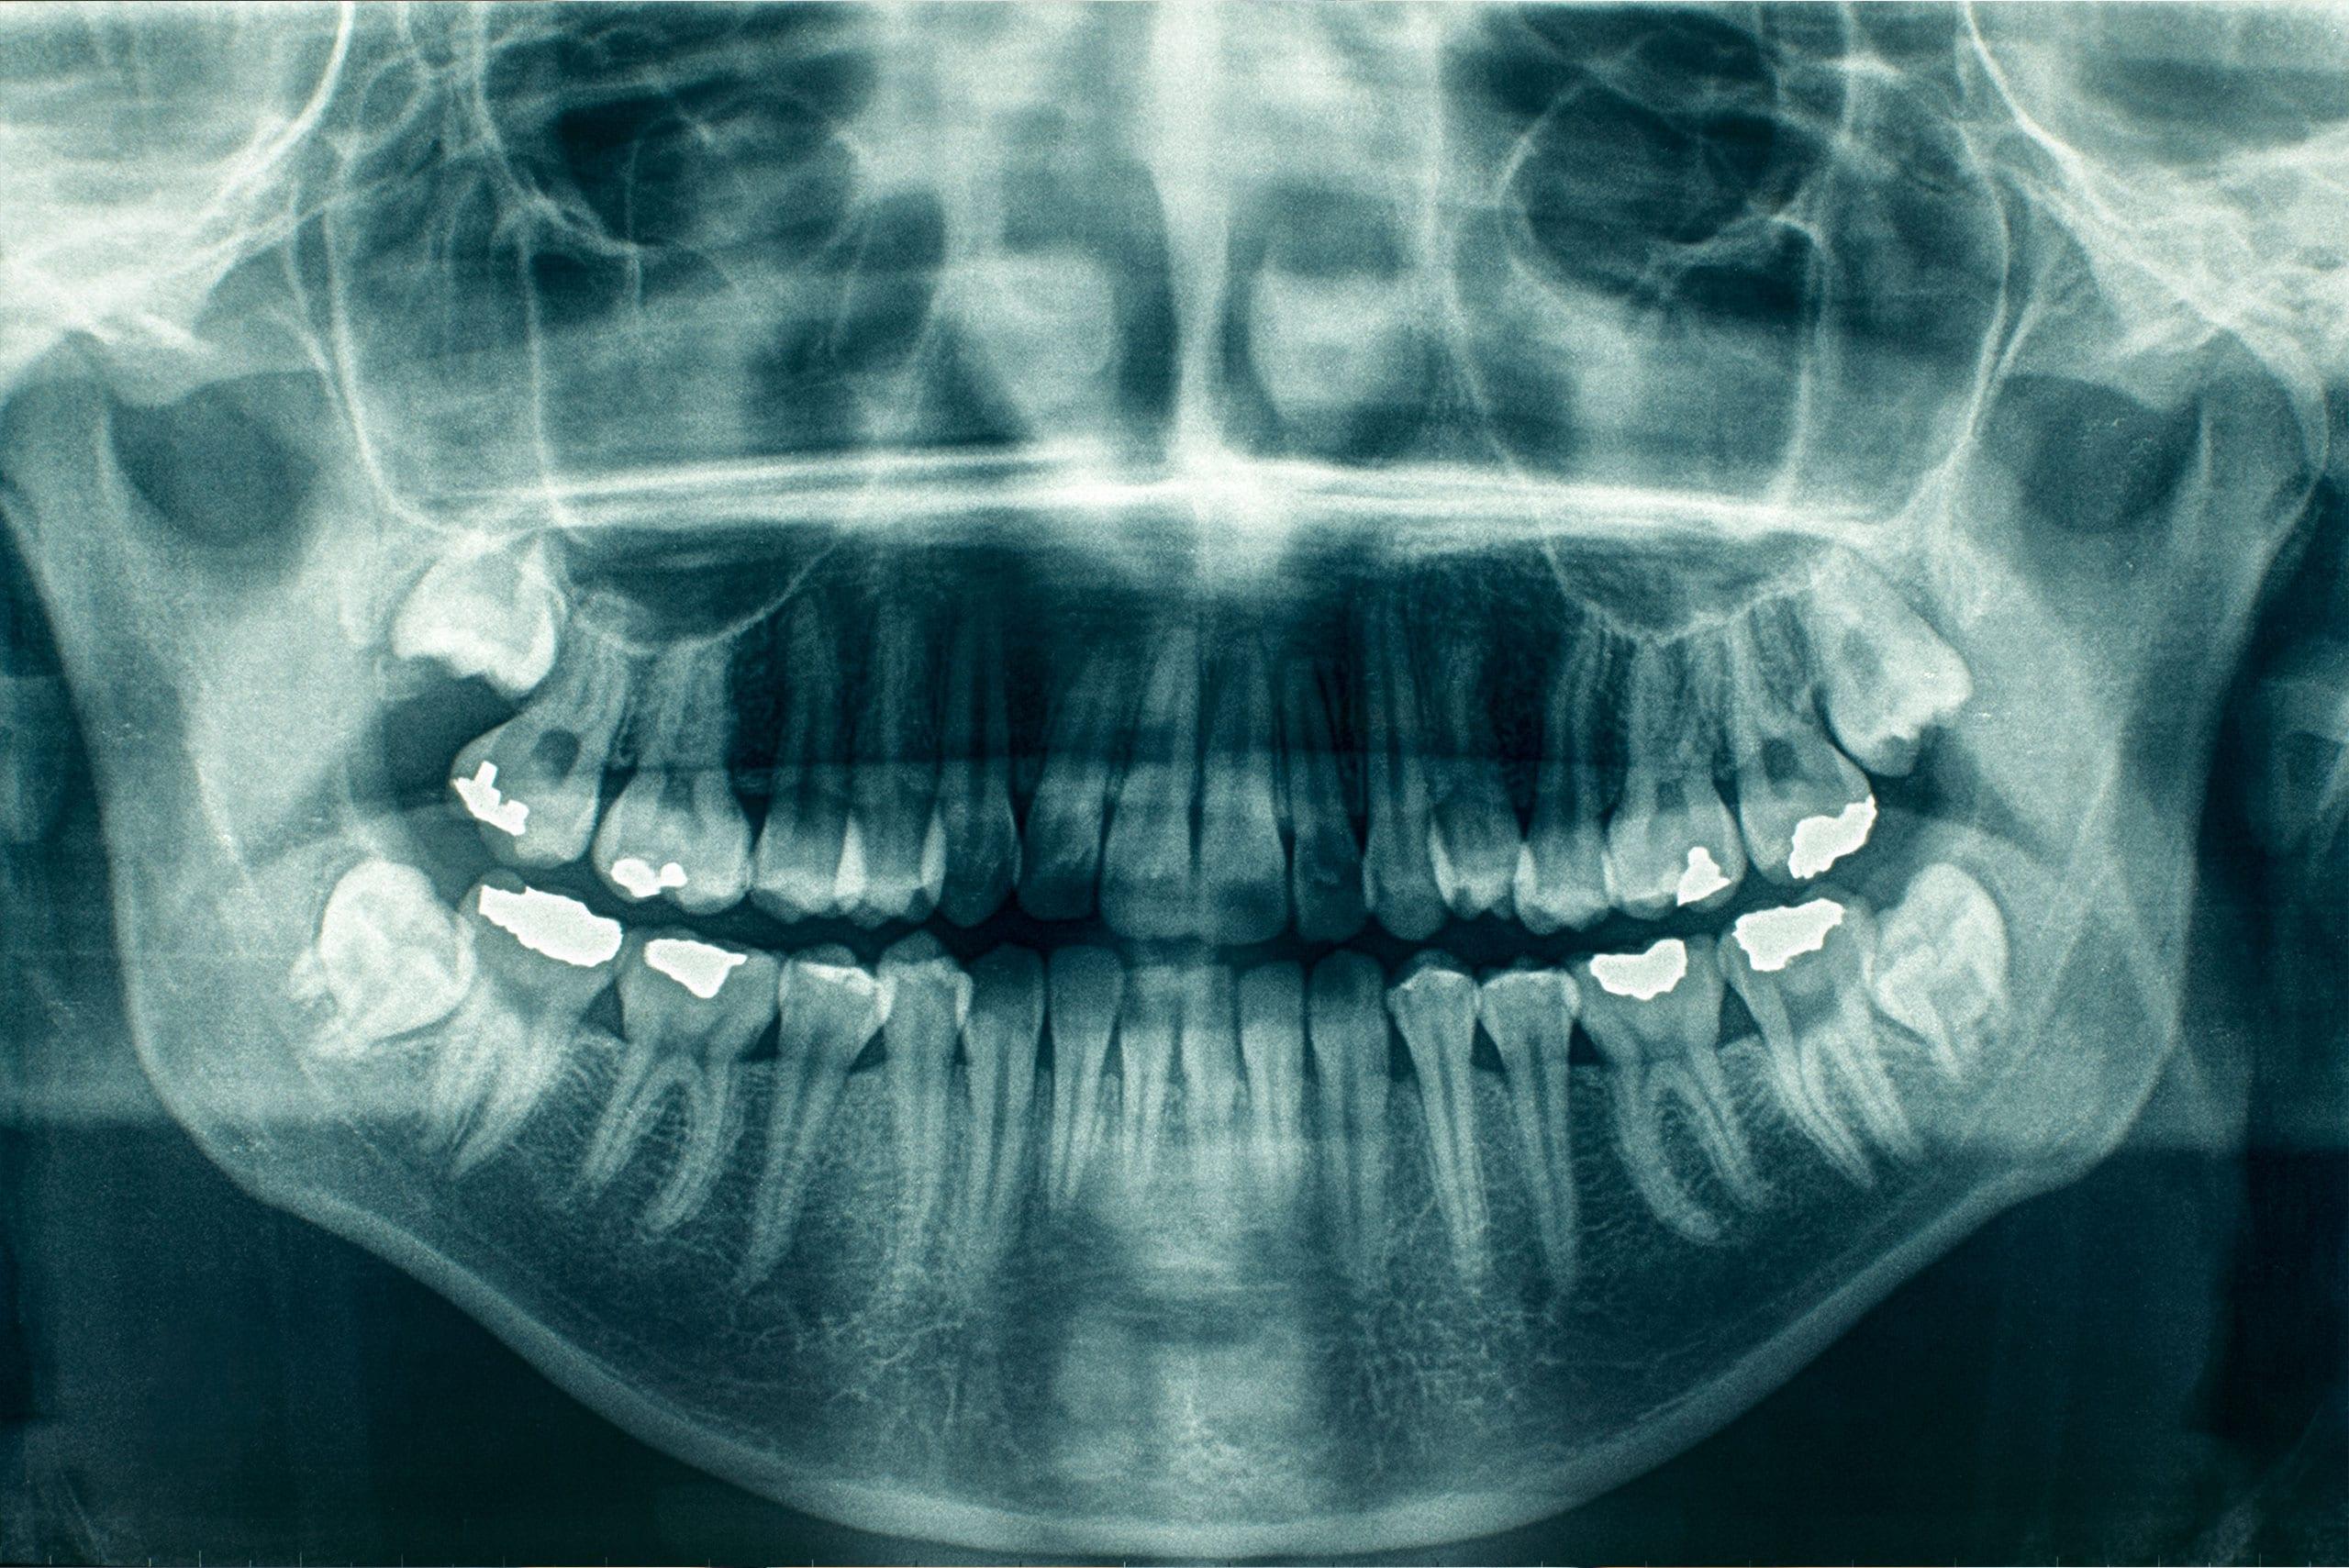 Dental Exam - Central Austin Dentist - Treaty Oak Dental - Dental Xrays